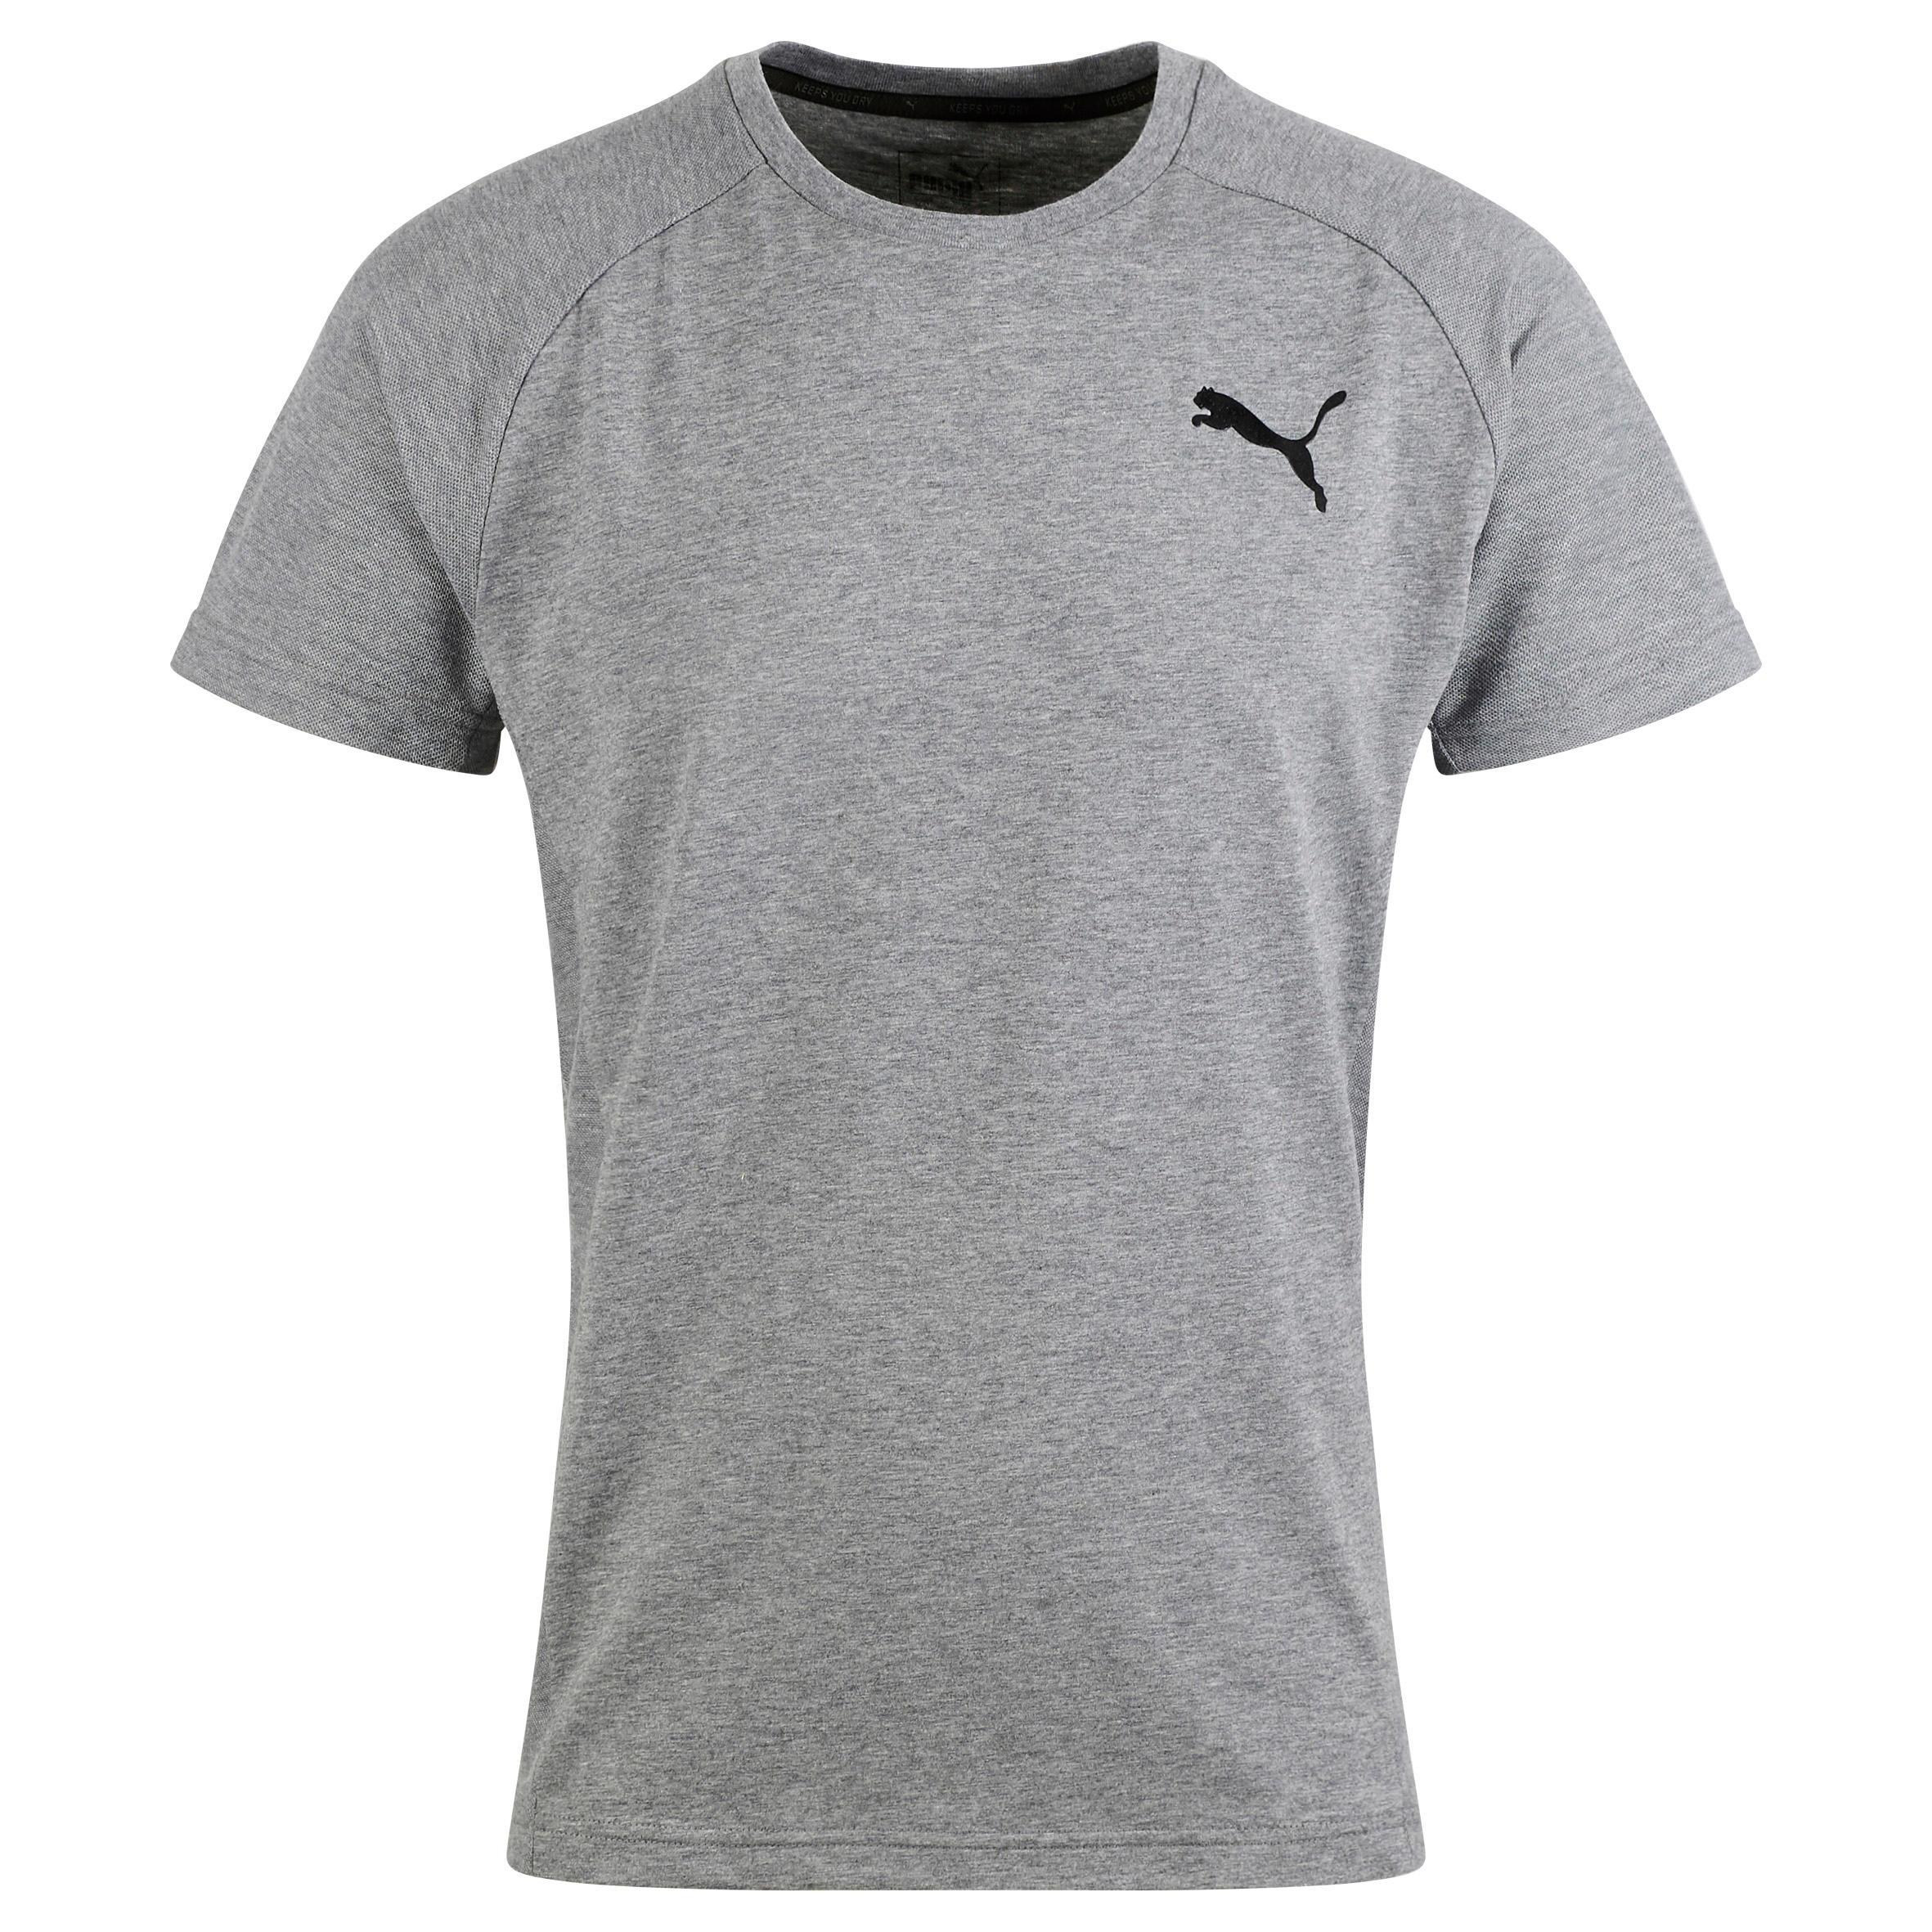 Puma Heren T-shirt Puma voor gym en pilates Evostripe grijs